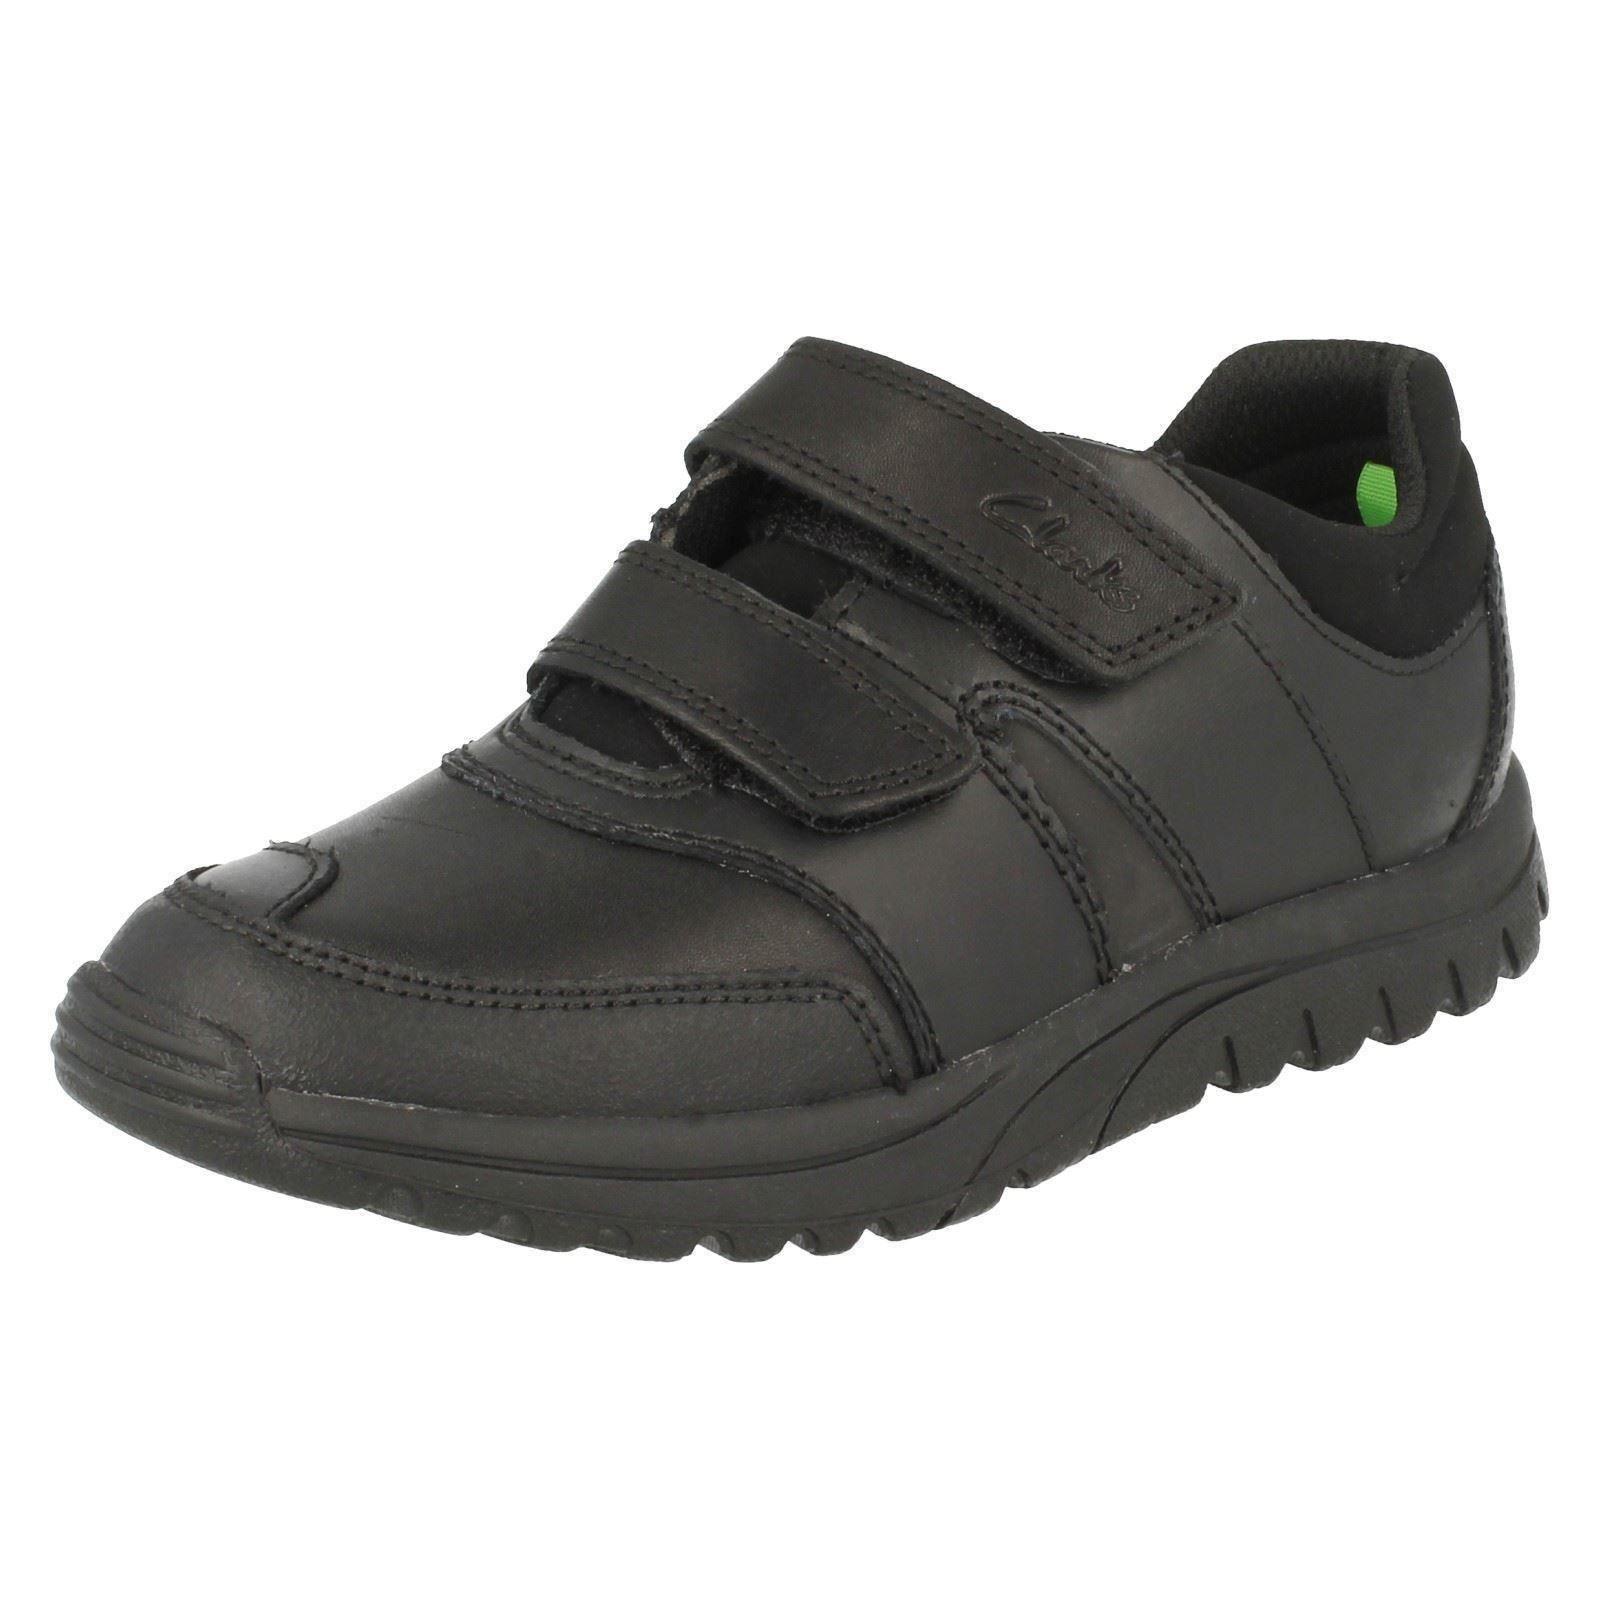 Clarks Boys Shoes School